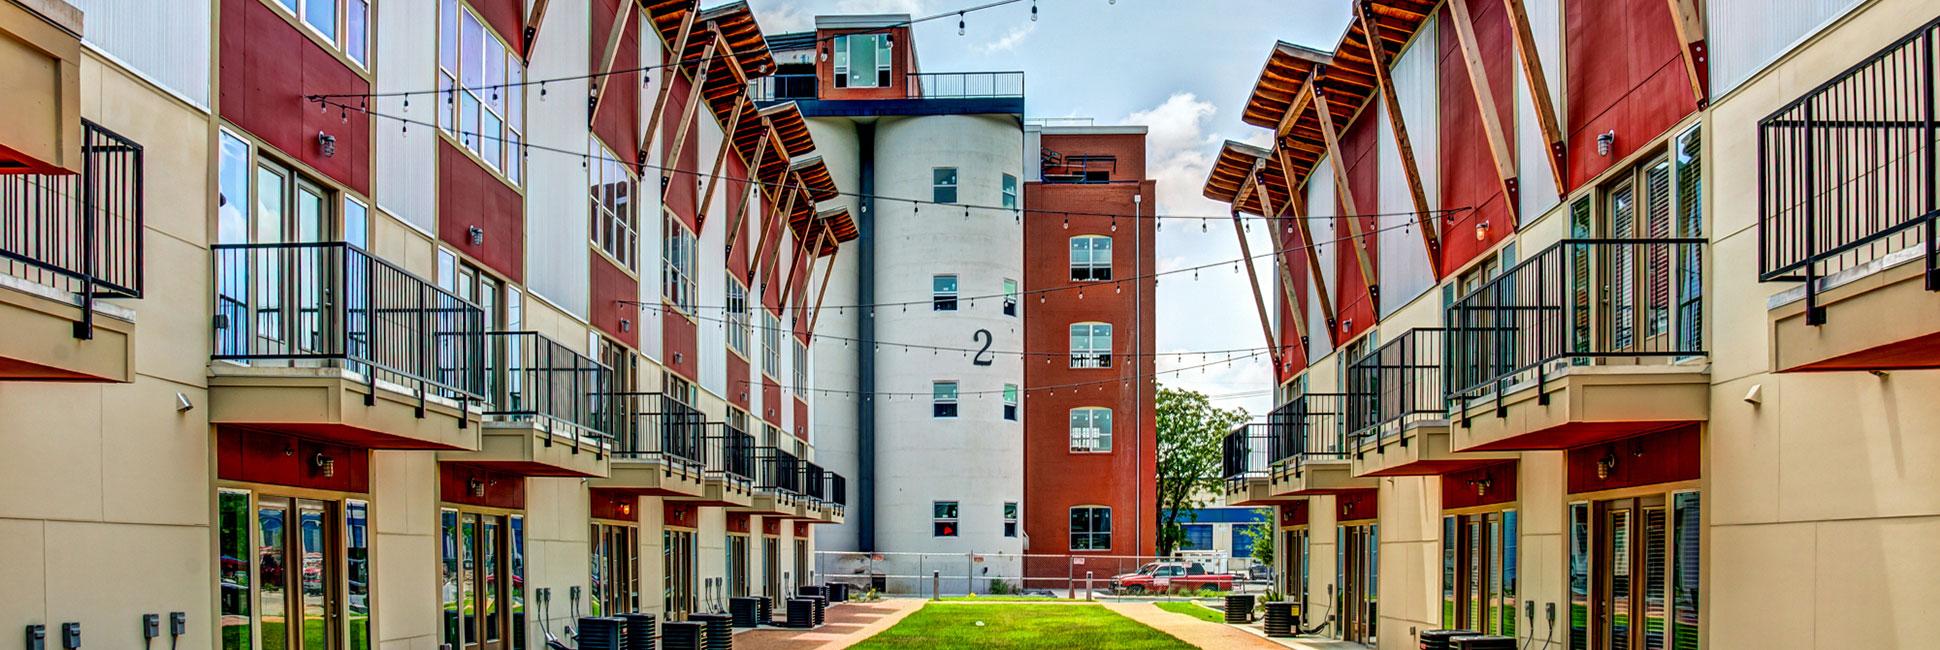 Peanut lofts, San Antonio